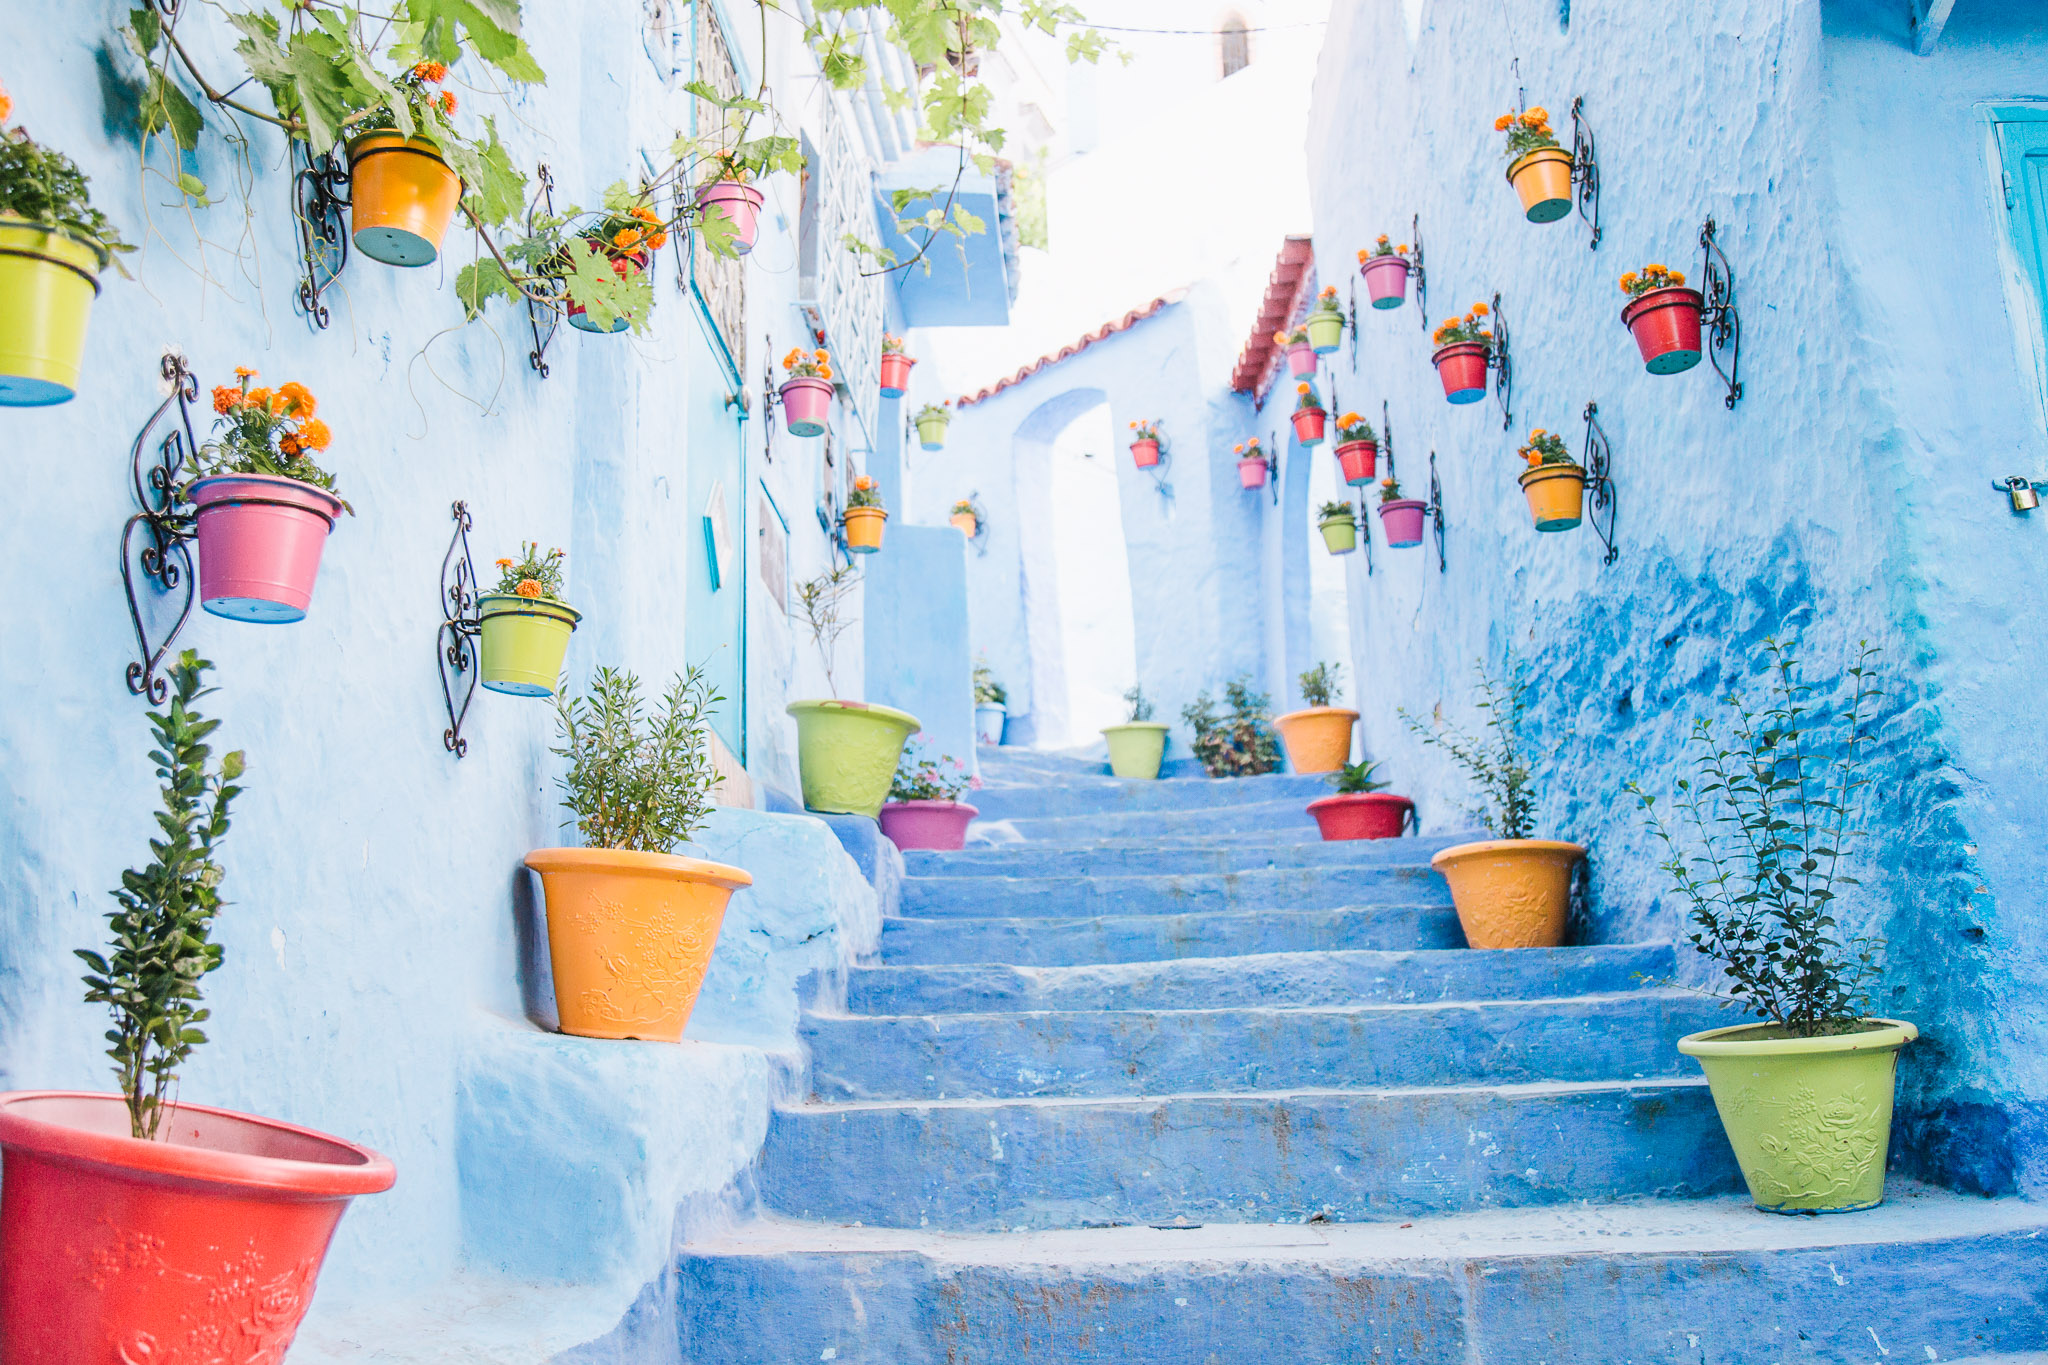 morocco-chefchaouen-blue-city-25.jpg